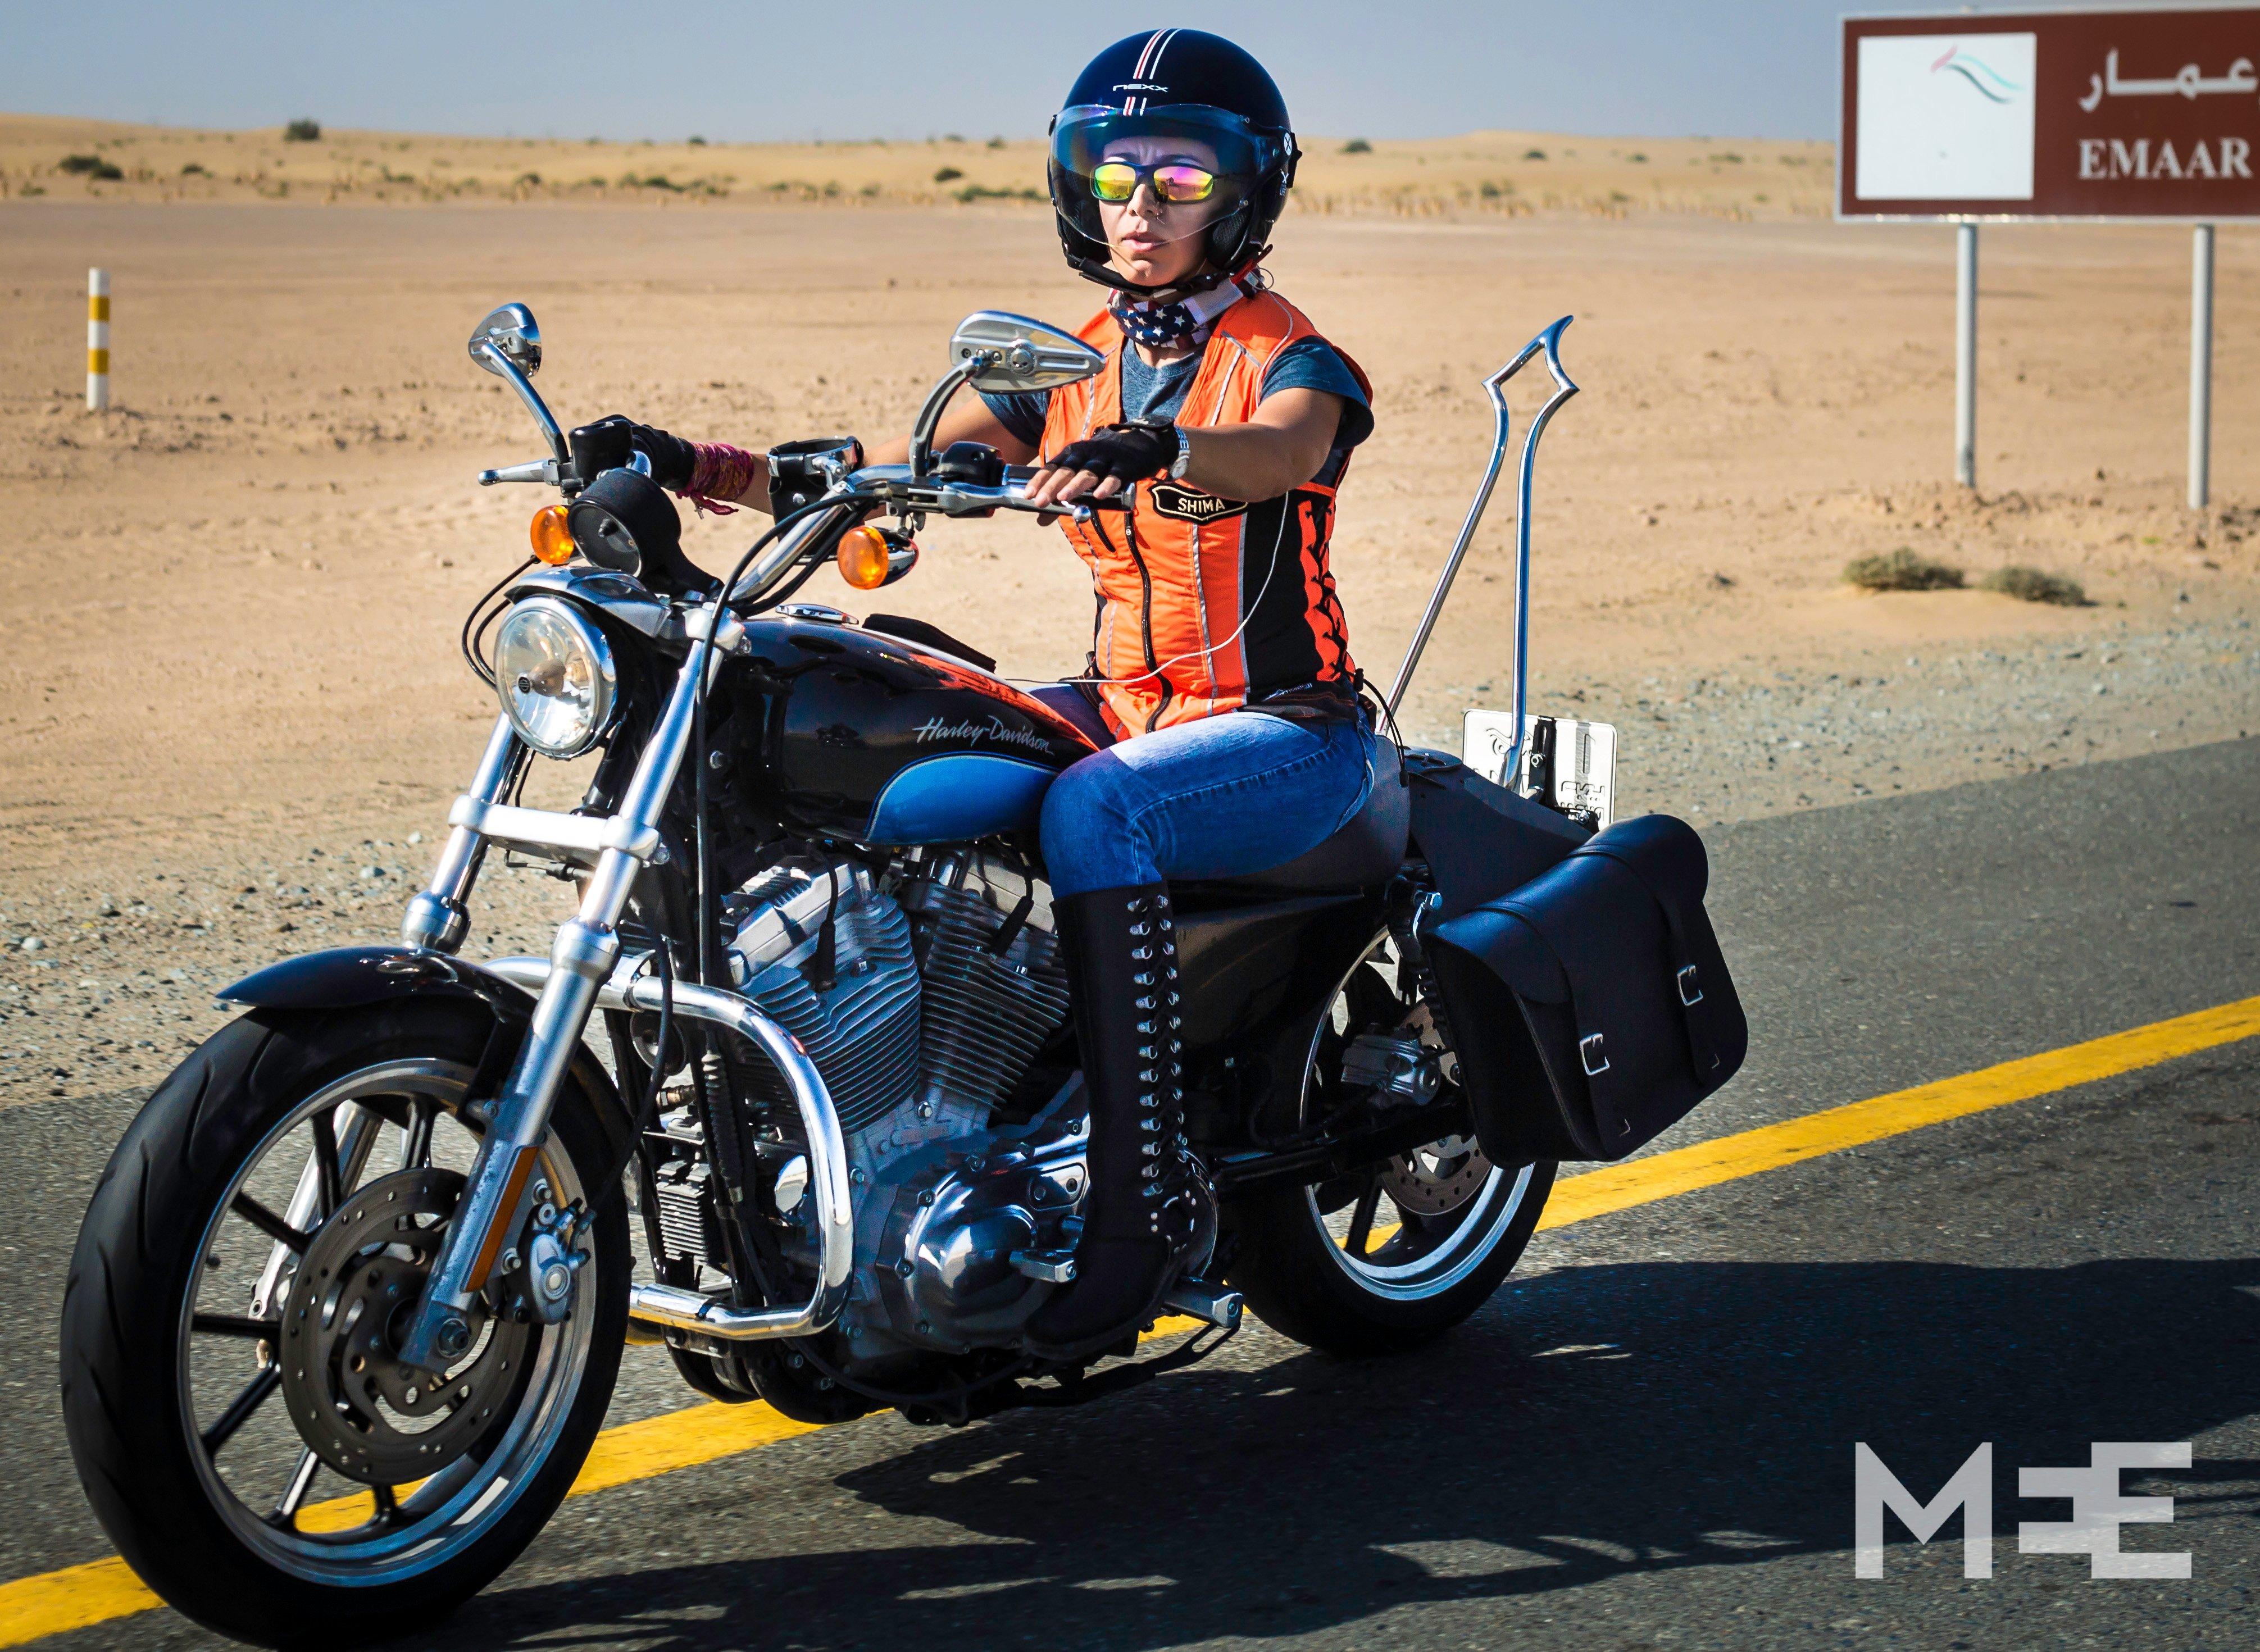 Harley Riders: Taking Back The Reins: Dubai's Female Bikers In Control